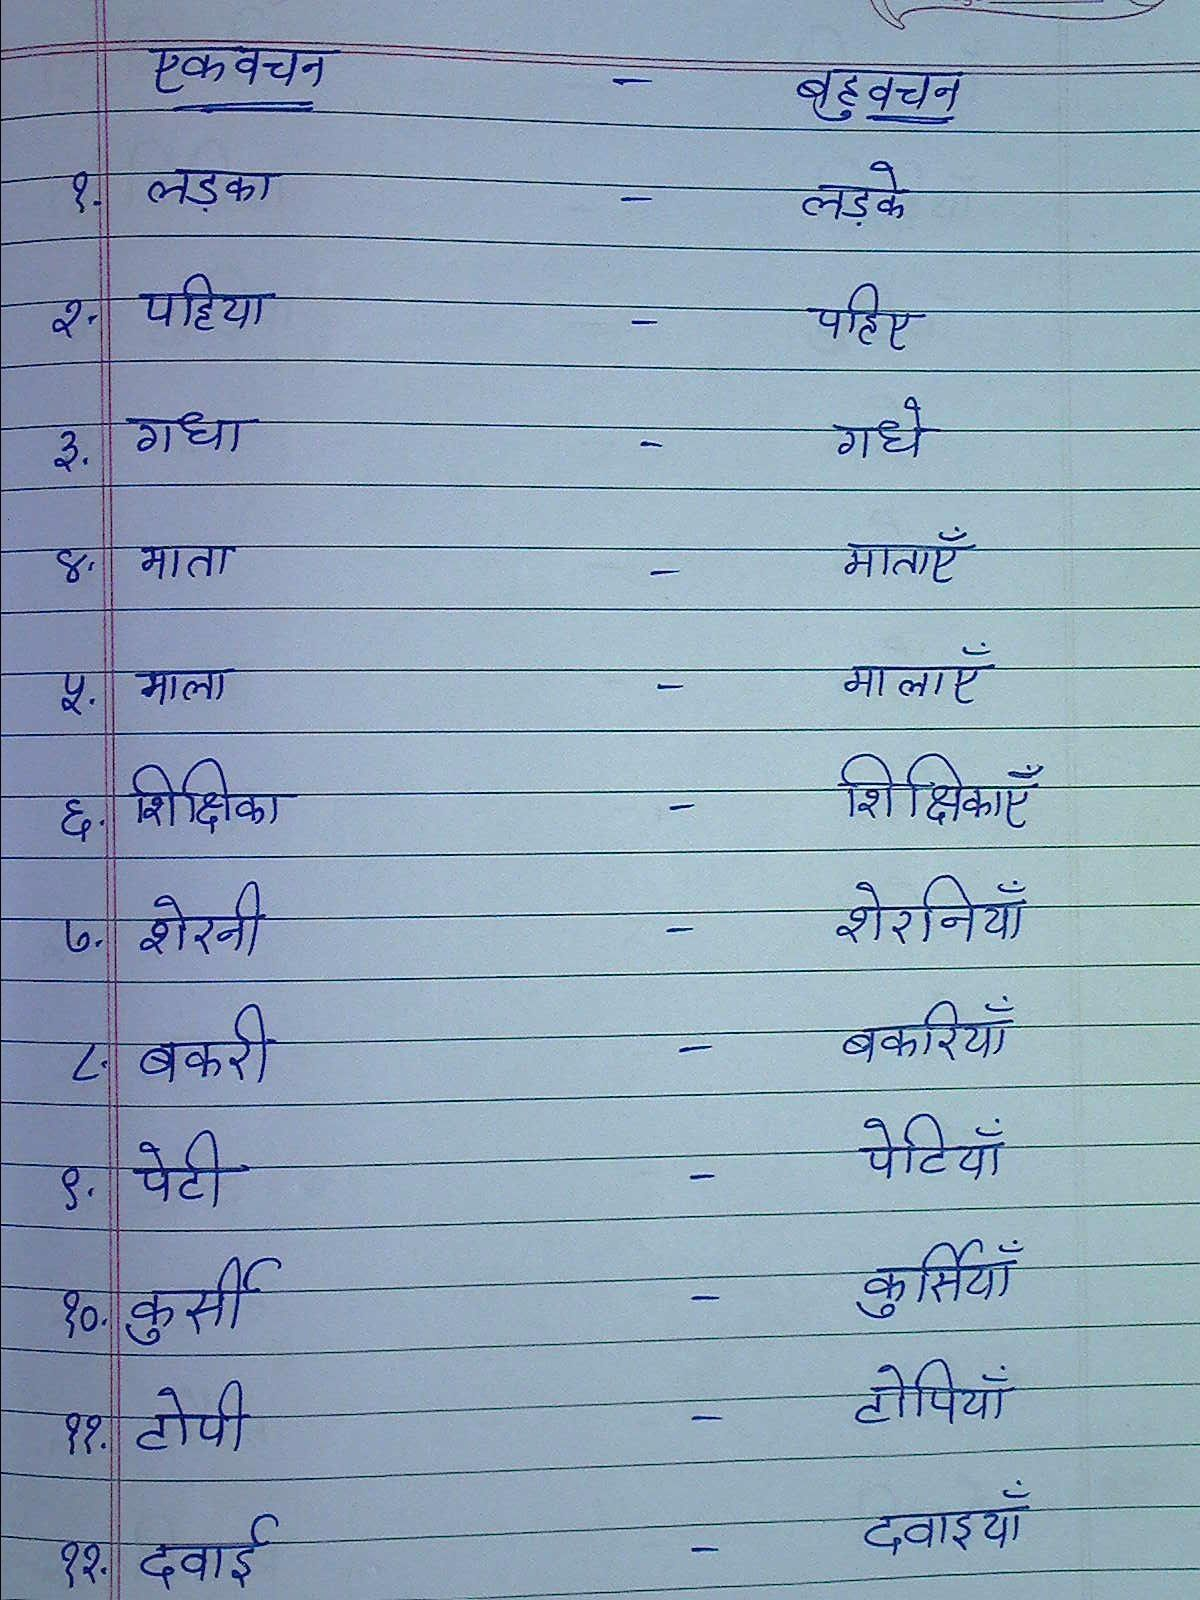 small resolution of Numbers Worksheet In Hindi Fresh Hindi Grammar Kriya Worksheets For Class 2  numbers worksheet in hind…   Worksheet for class 2